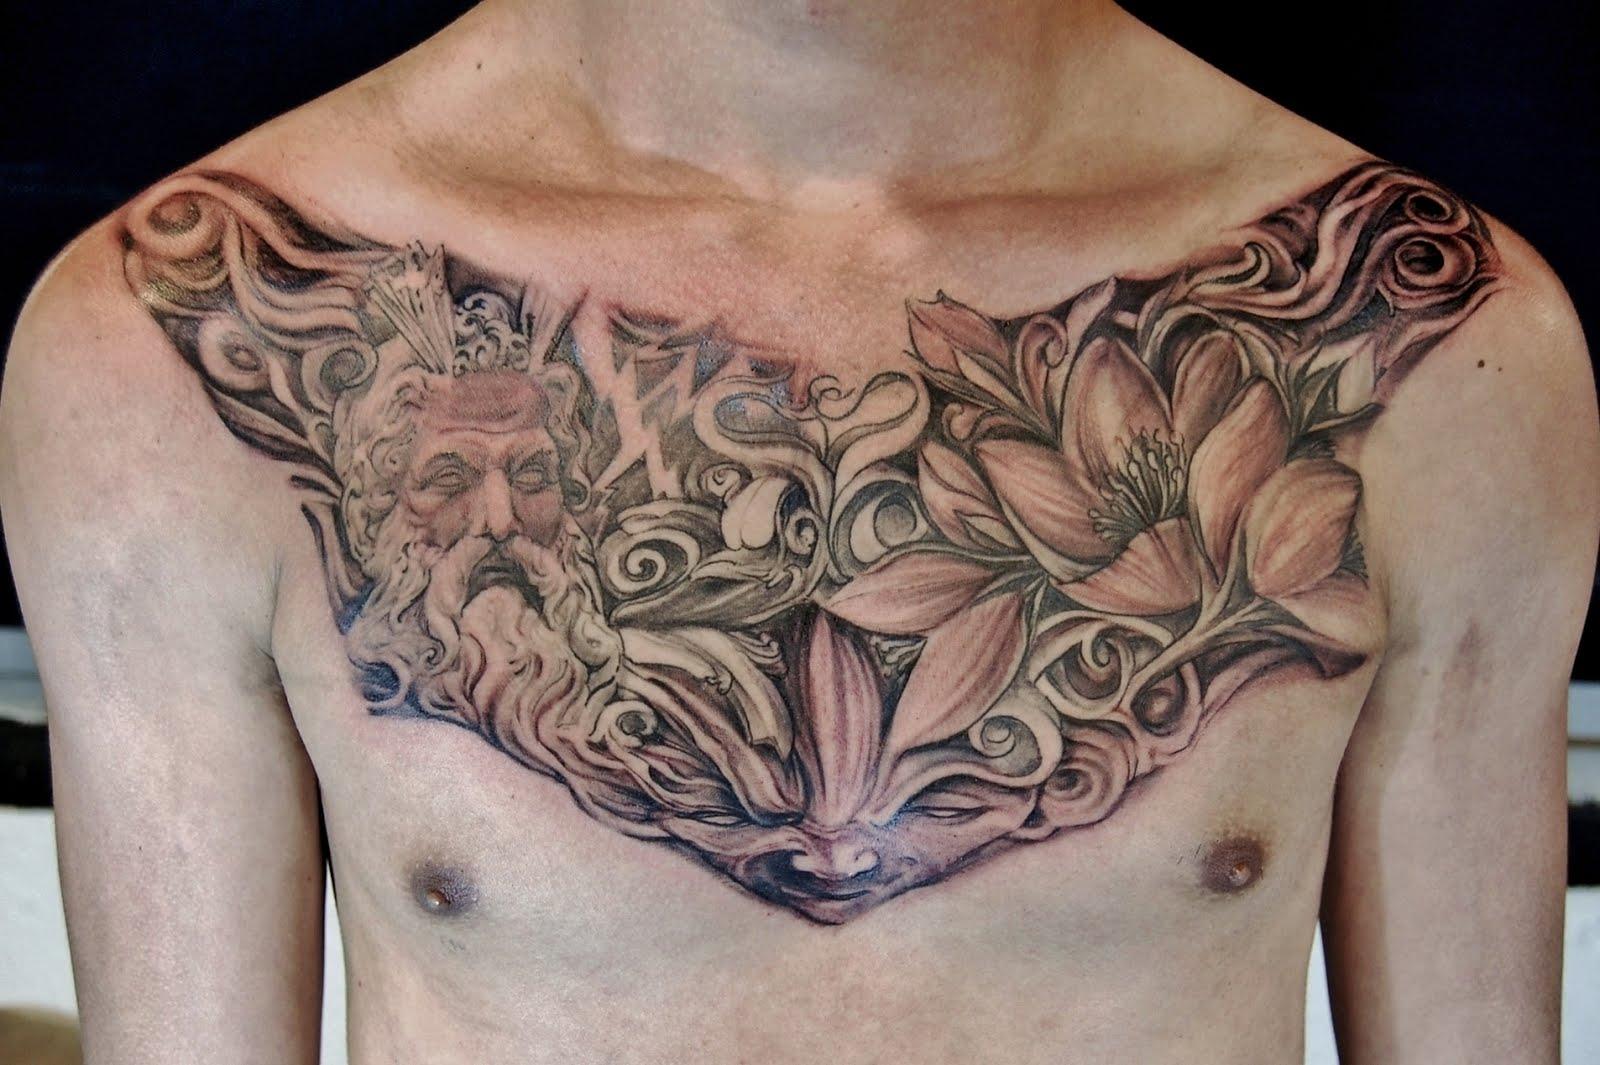 Nail Art Designs: Tribal Phoenix Tattoos For Men - photo#31